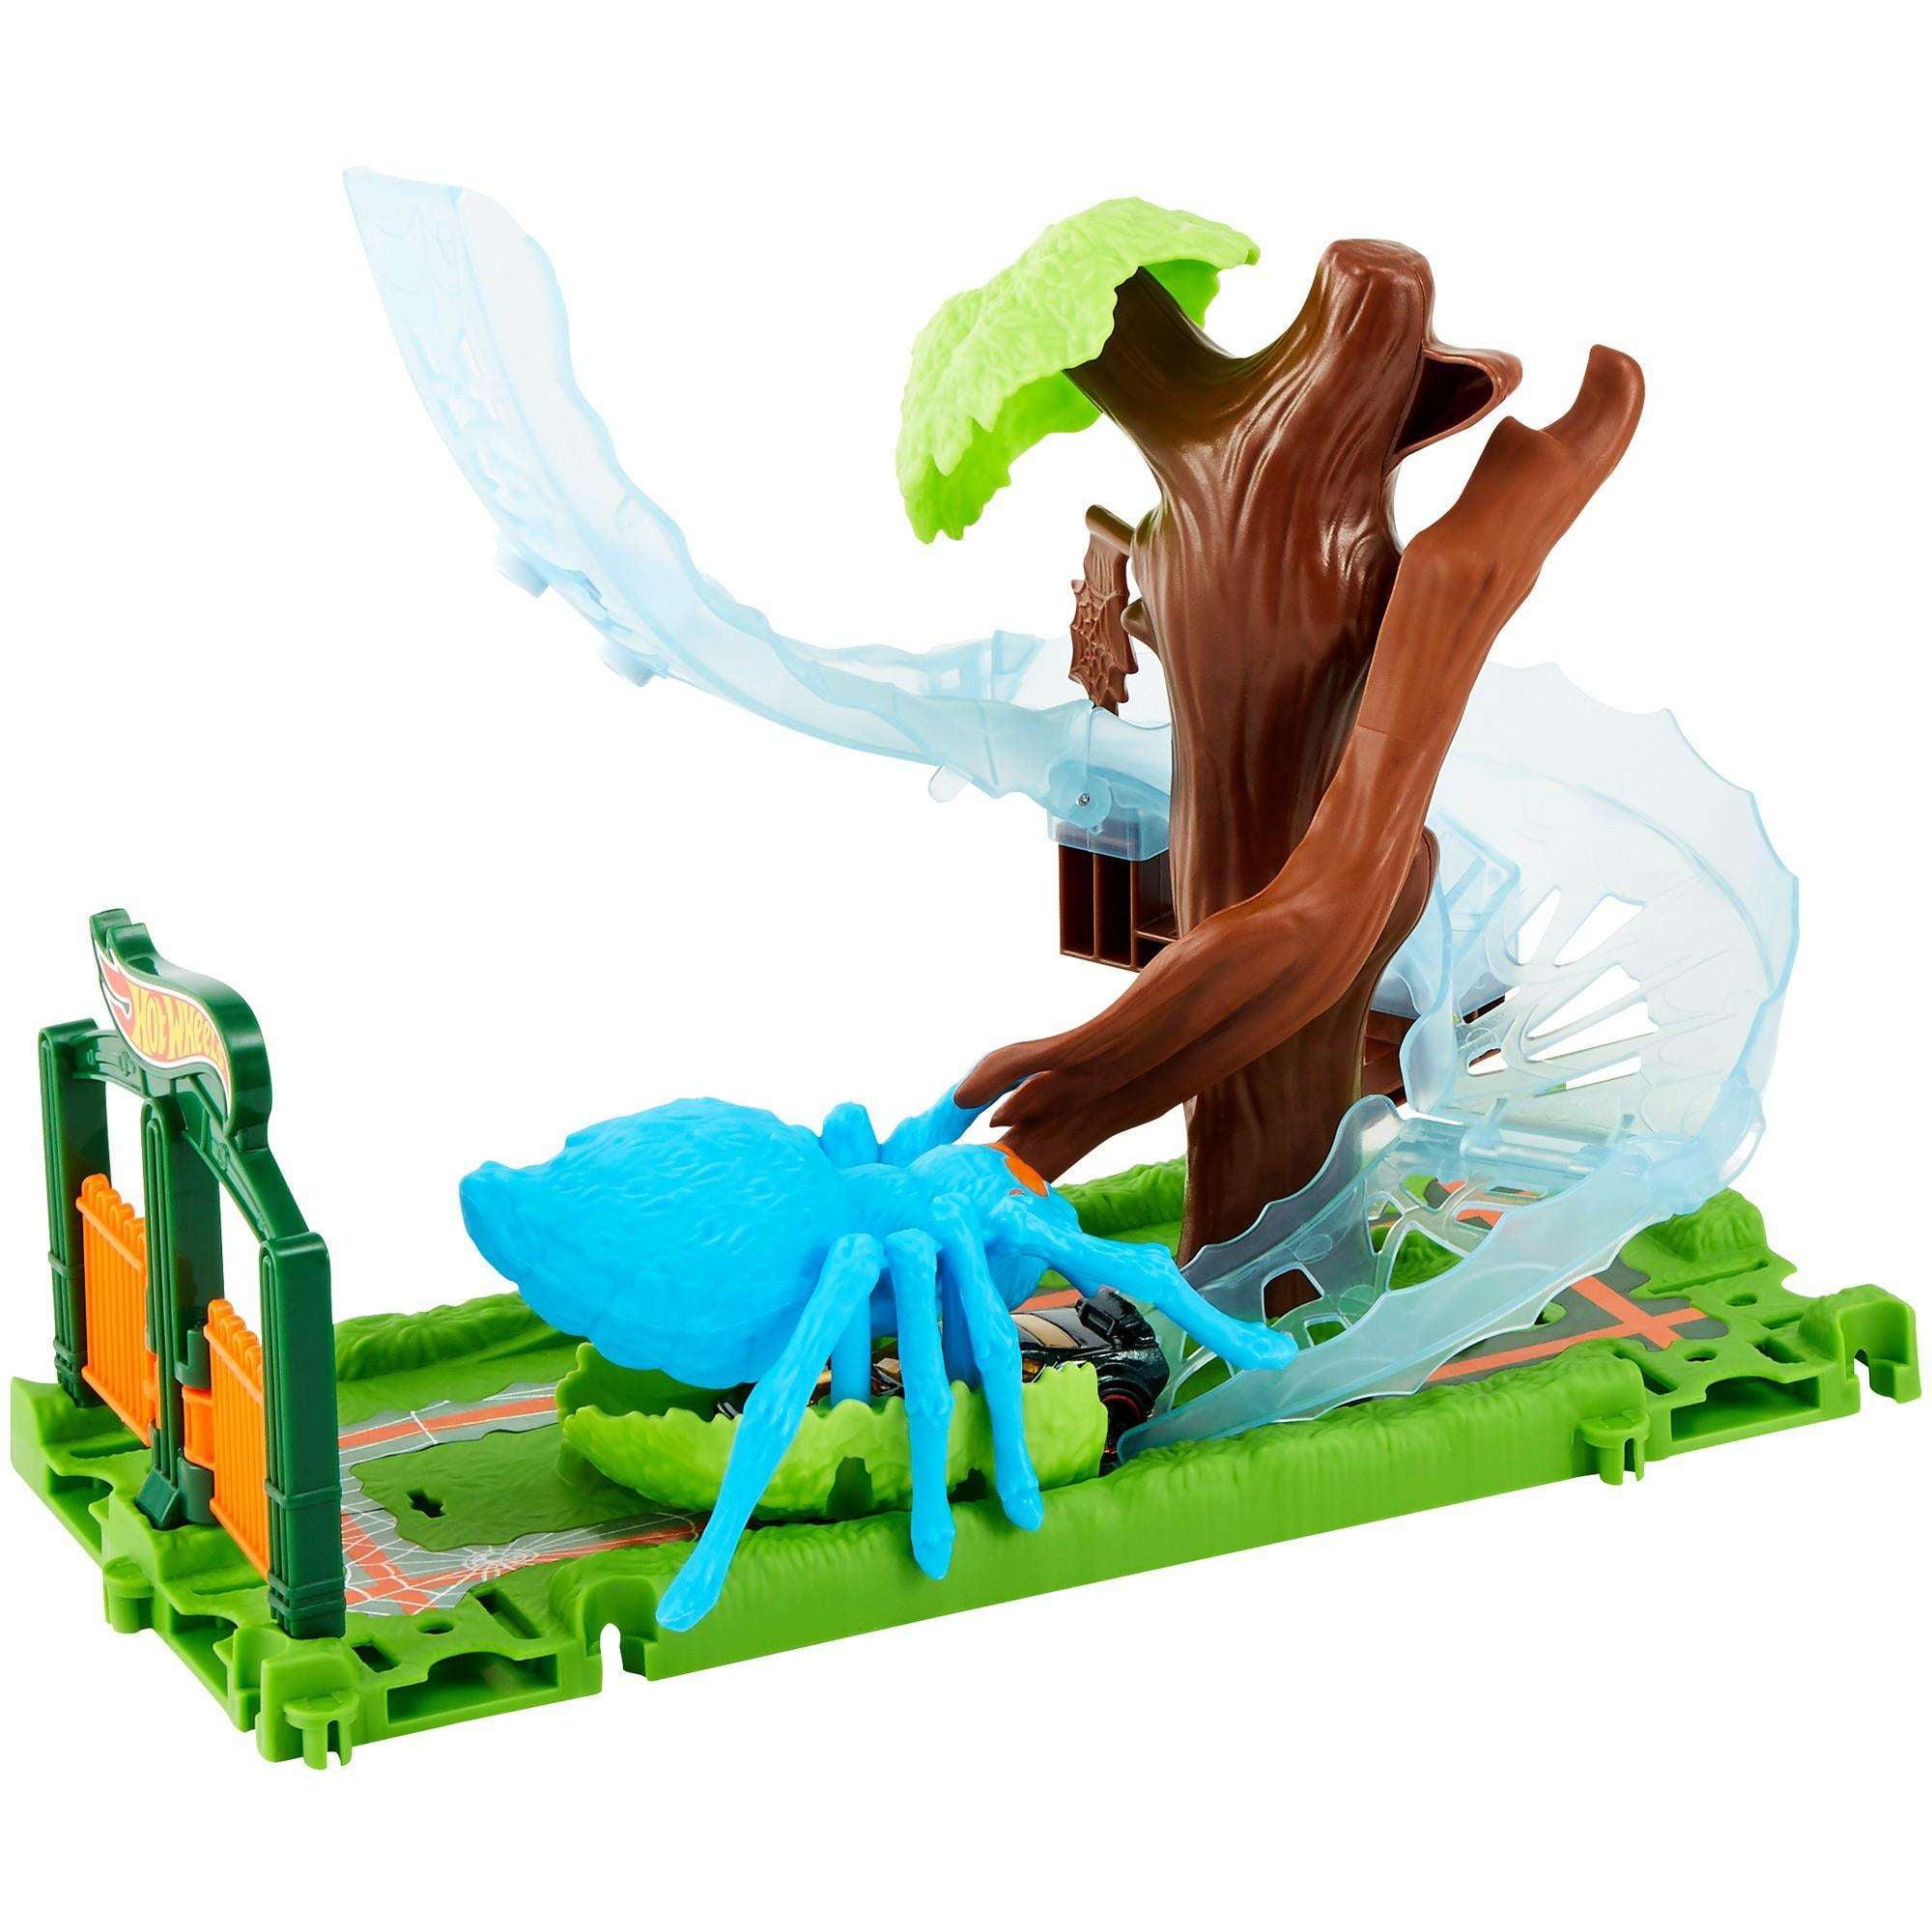 Hot Wheels City Spider Park Attack Play Set by Mattel